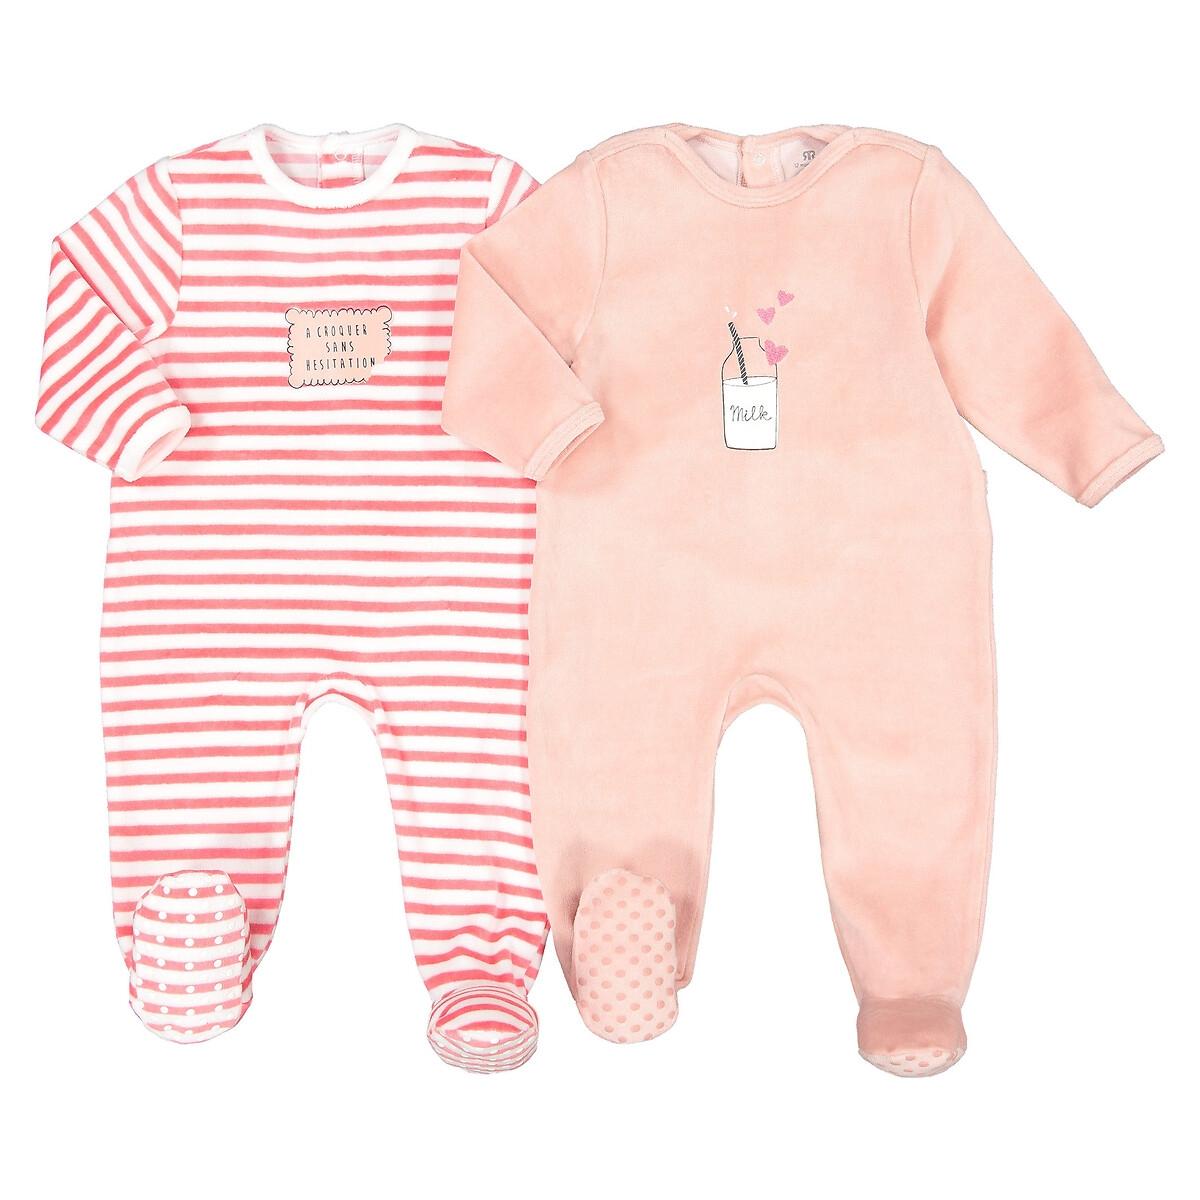 Комплект из 2 пижам из LaRedoute Велюра 0 мес - 3 года 1 мес. - 54 см розовый пижама laredoute с носочками из велюра 0 мес 3 года 3 мес 60 см серый